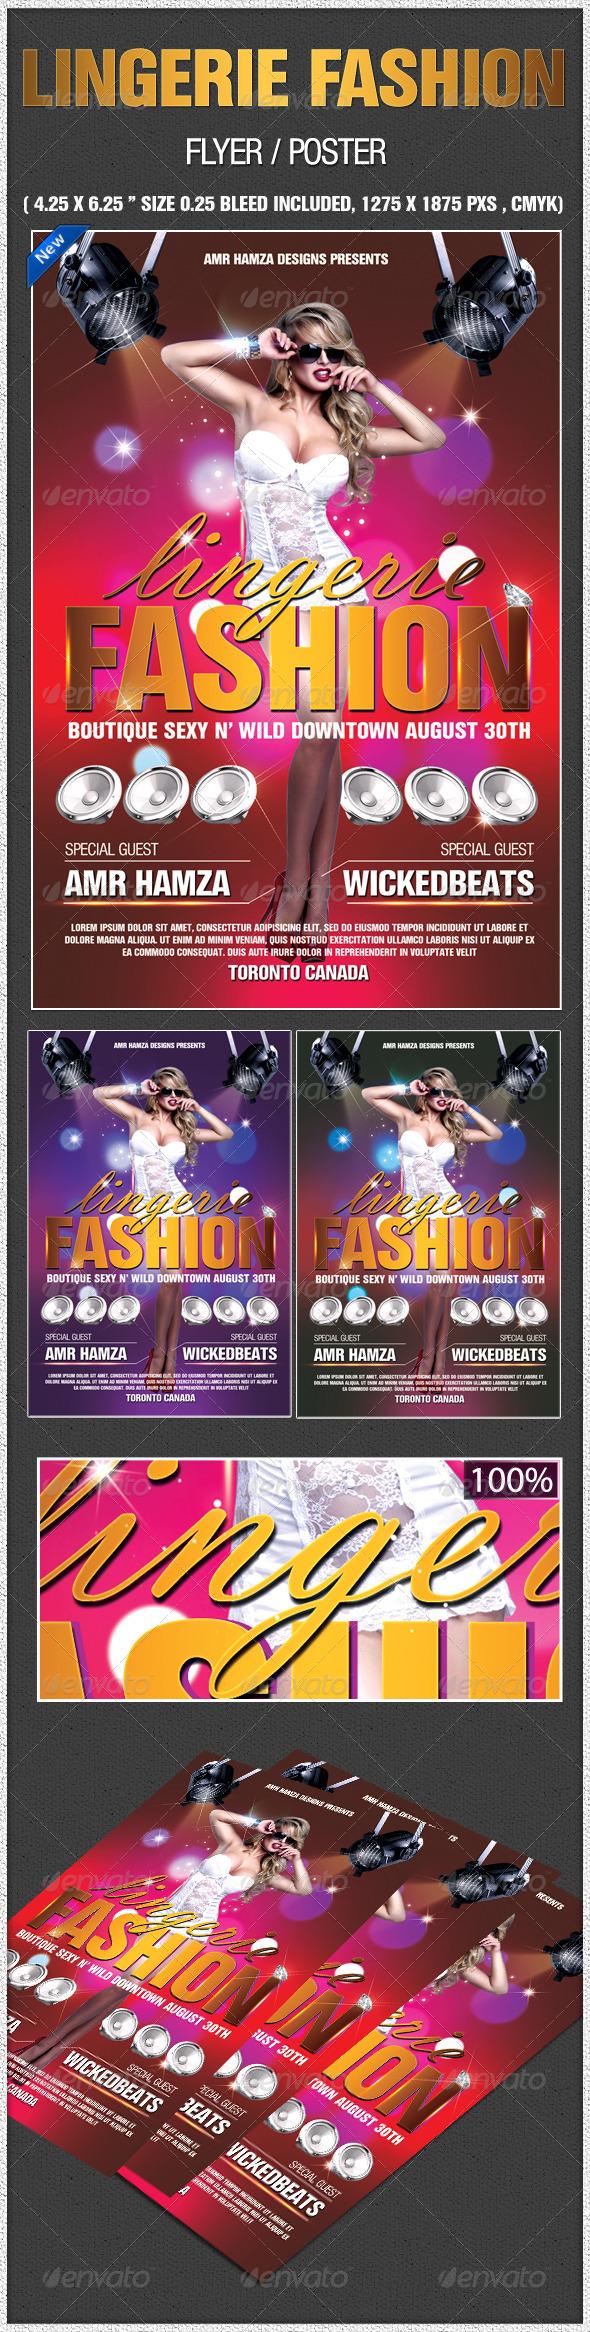 Lingerie Fashion Flyer Poster | GraphicRiver